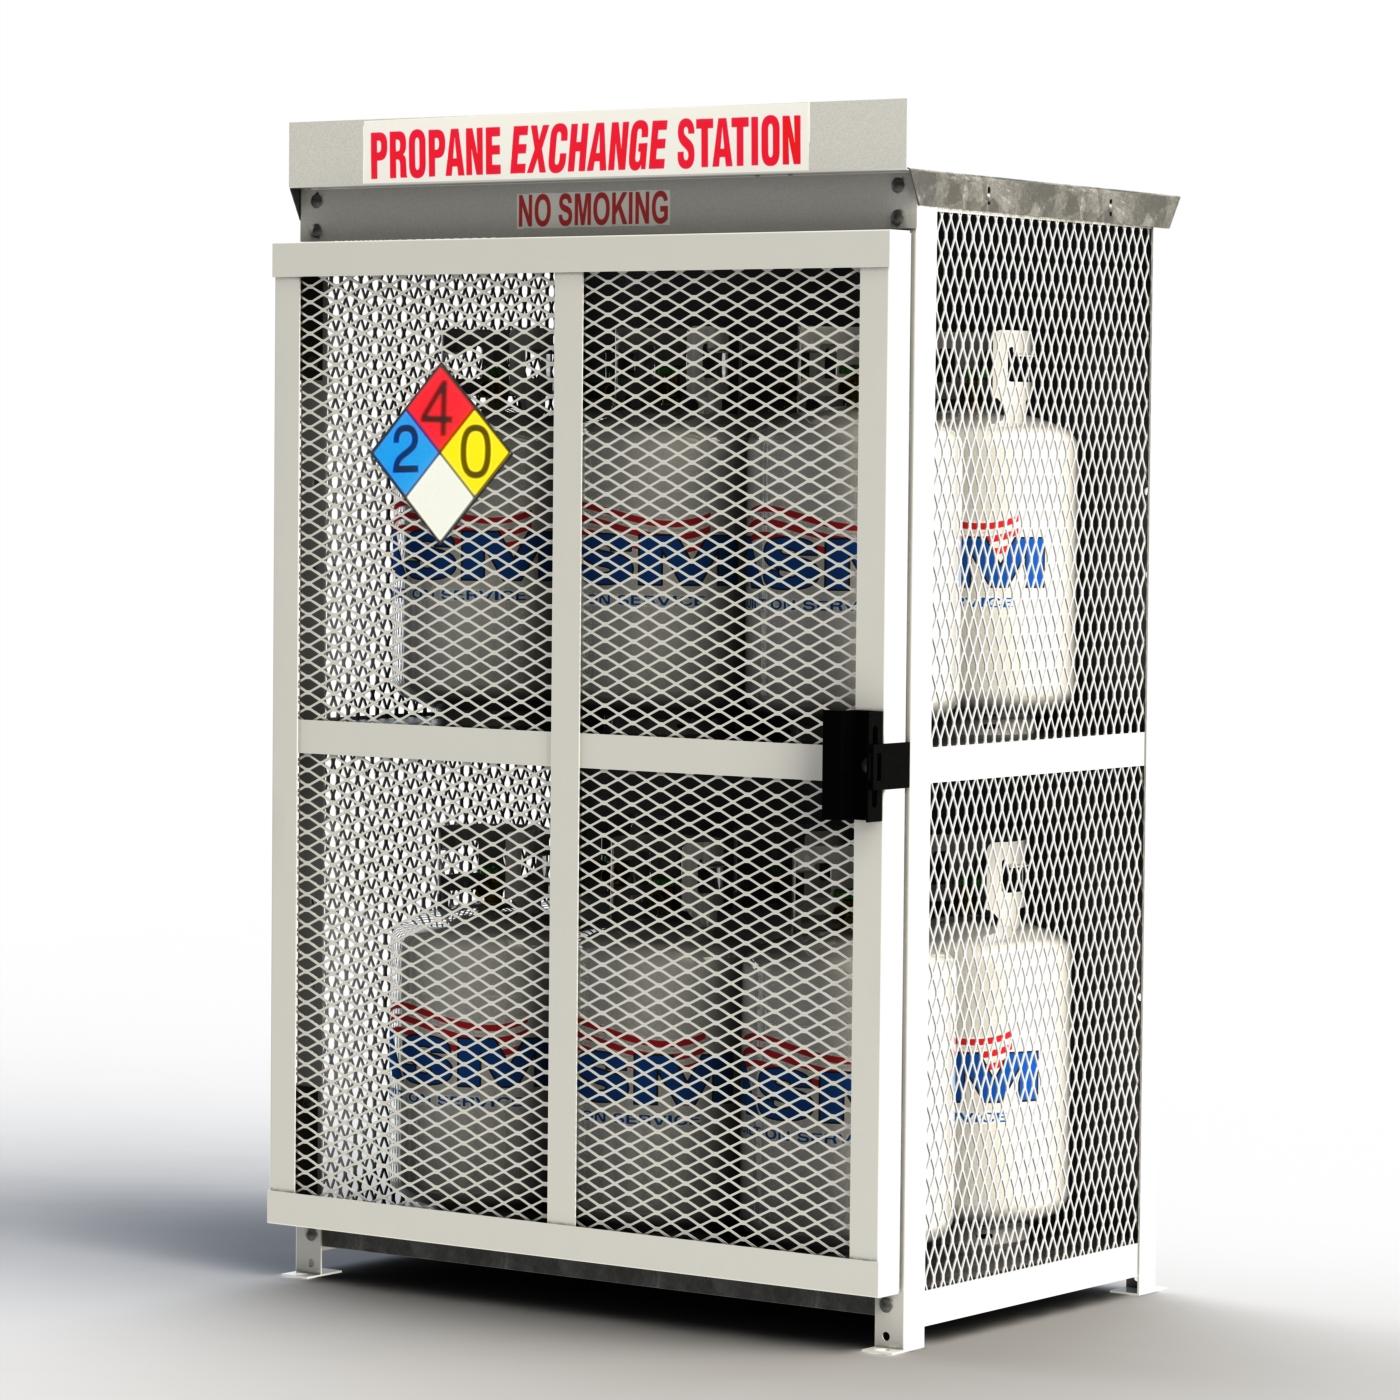 30lb Propane Cylinder Storage Cage In Steel Twelve 30lb